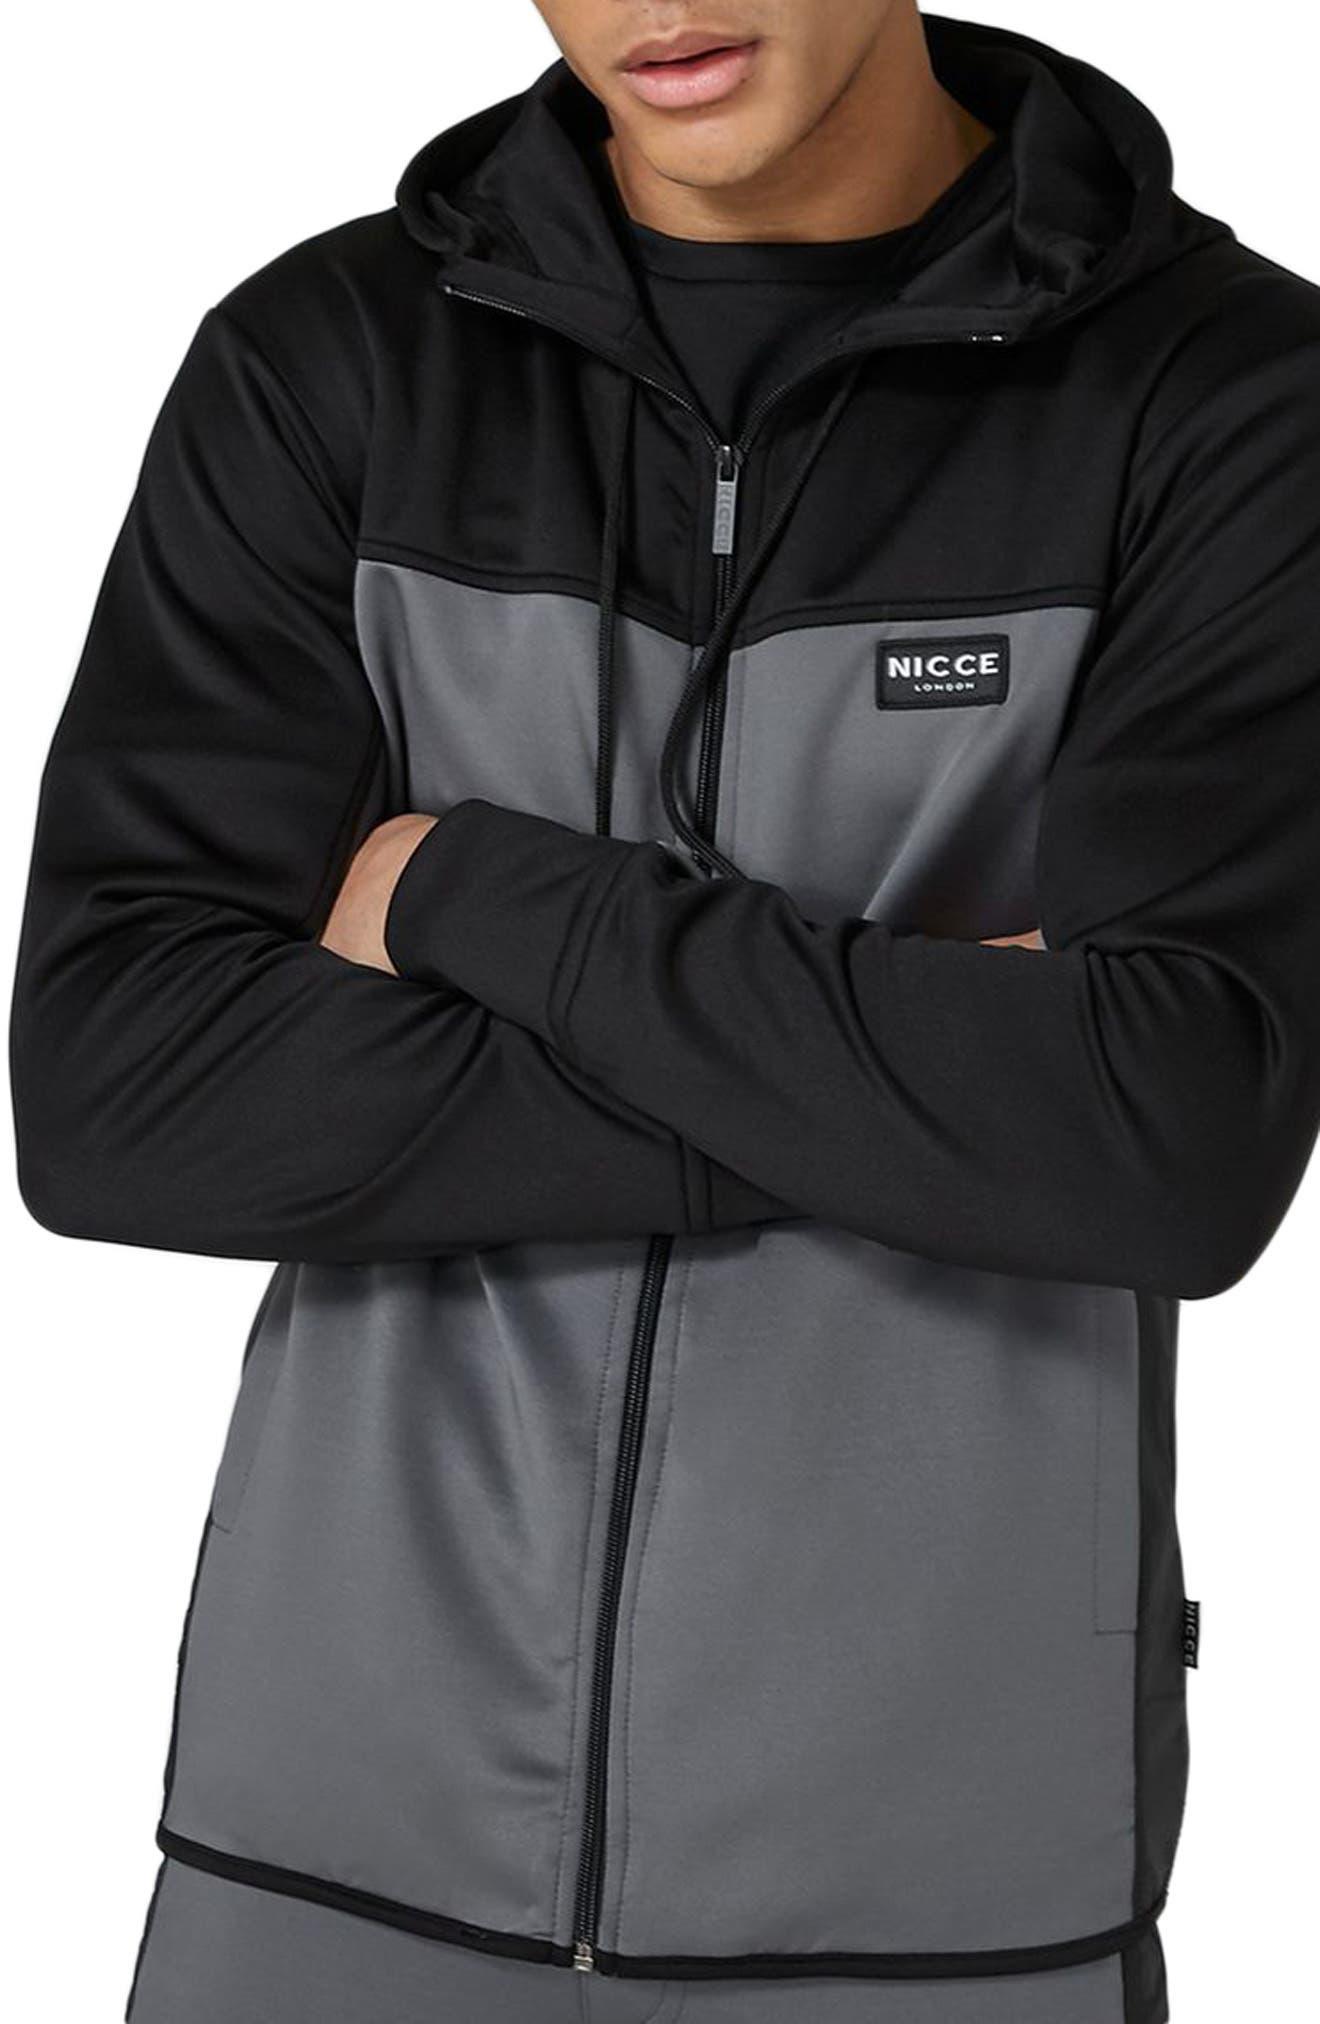 Main Image - Topshop NICCE Hybrid Track Jacket